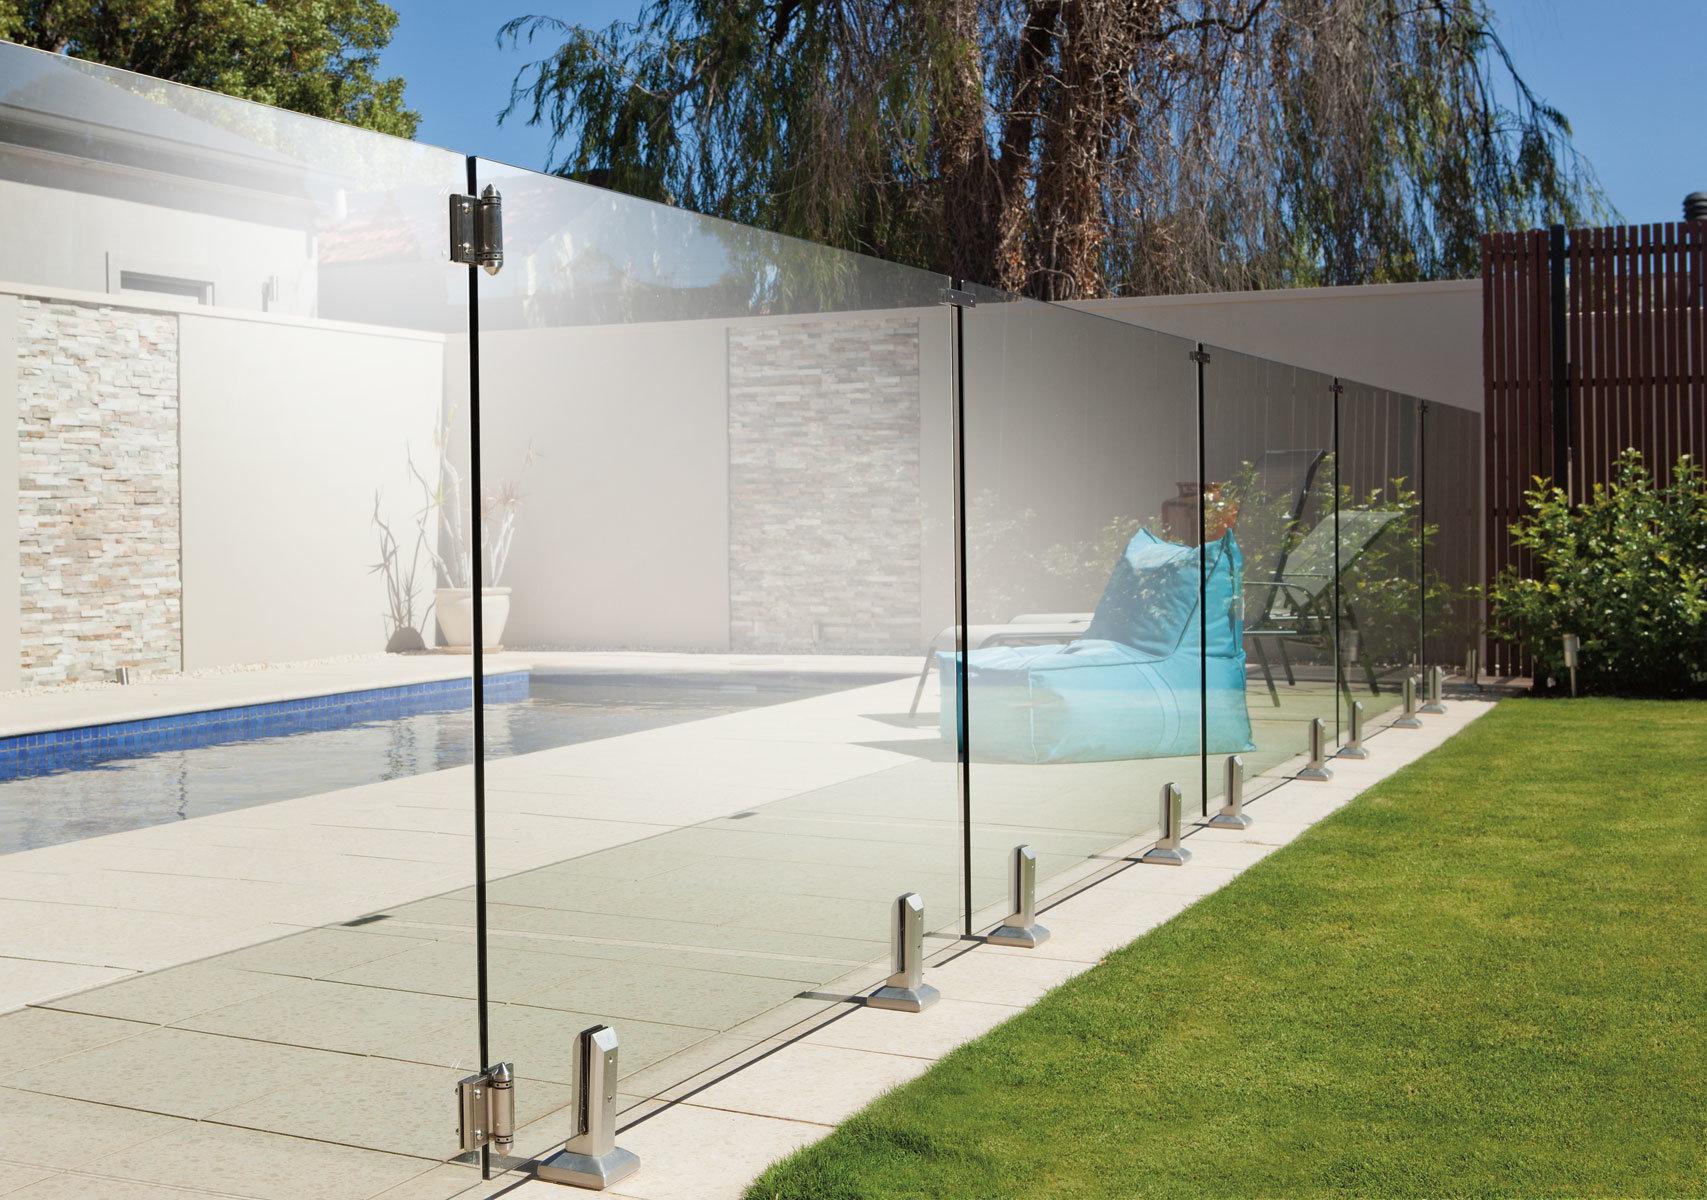 China Balcony Glass Balustrade Stainless Steel Spigot